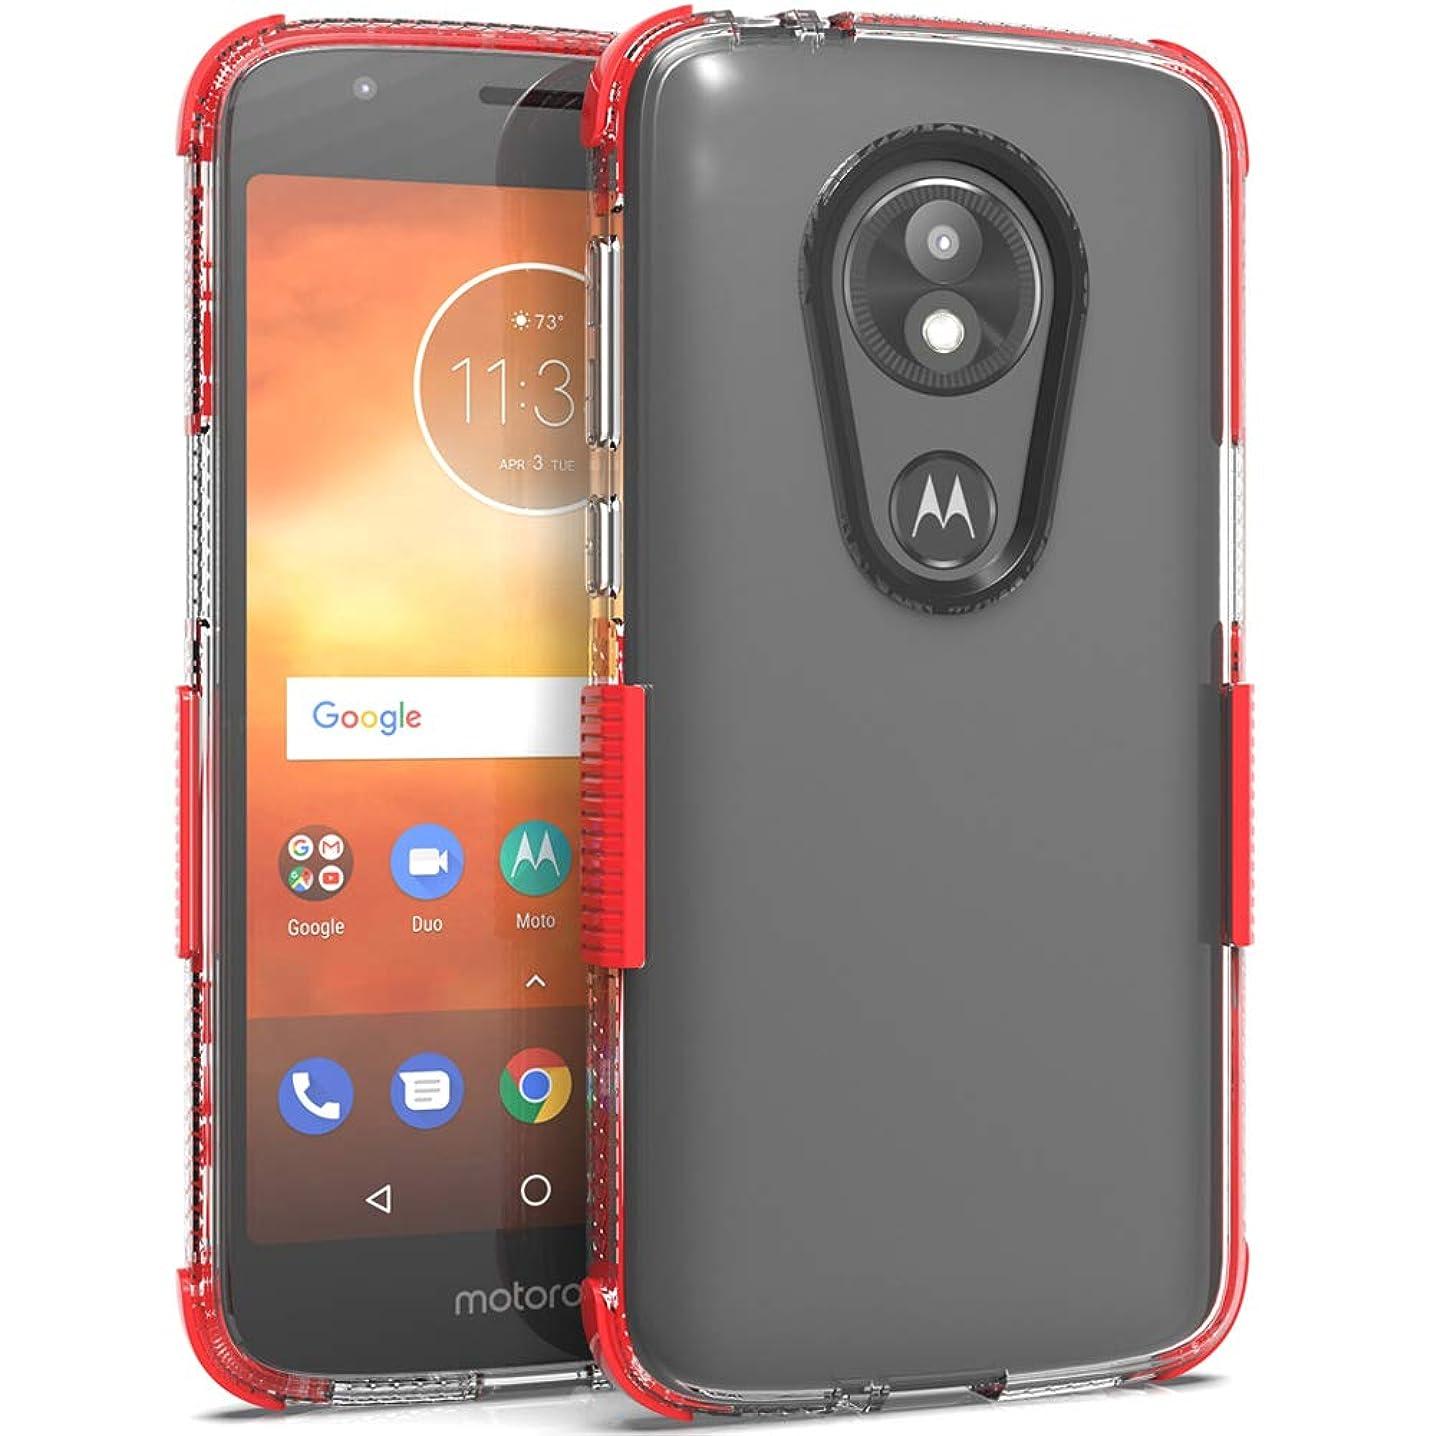 Telegaming for Motorola Moto E5 Play/Moto E5 Cruise Case, Ultra Thin TPU Bumper & Hard Acrylic Back Clear Case Shock Absorption Anti Scratch Protective Cover for Motorola Moto E5 Play Red